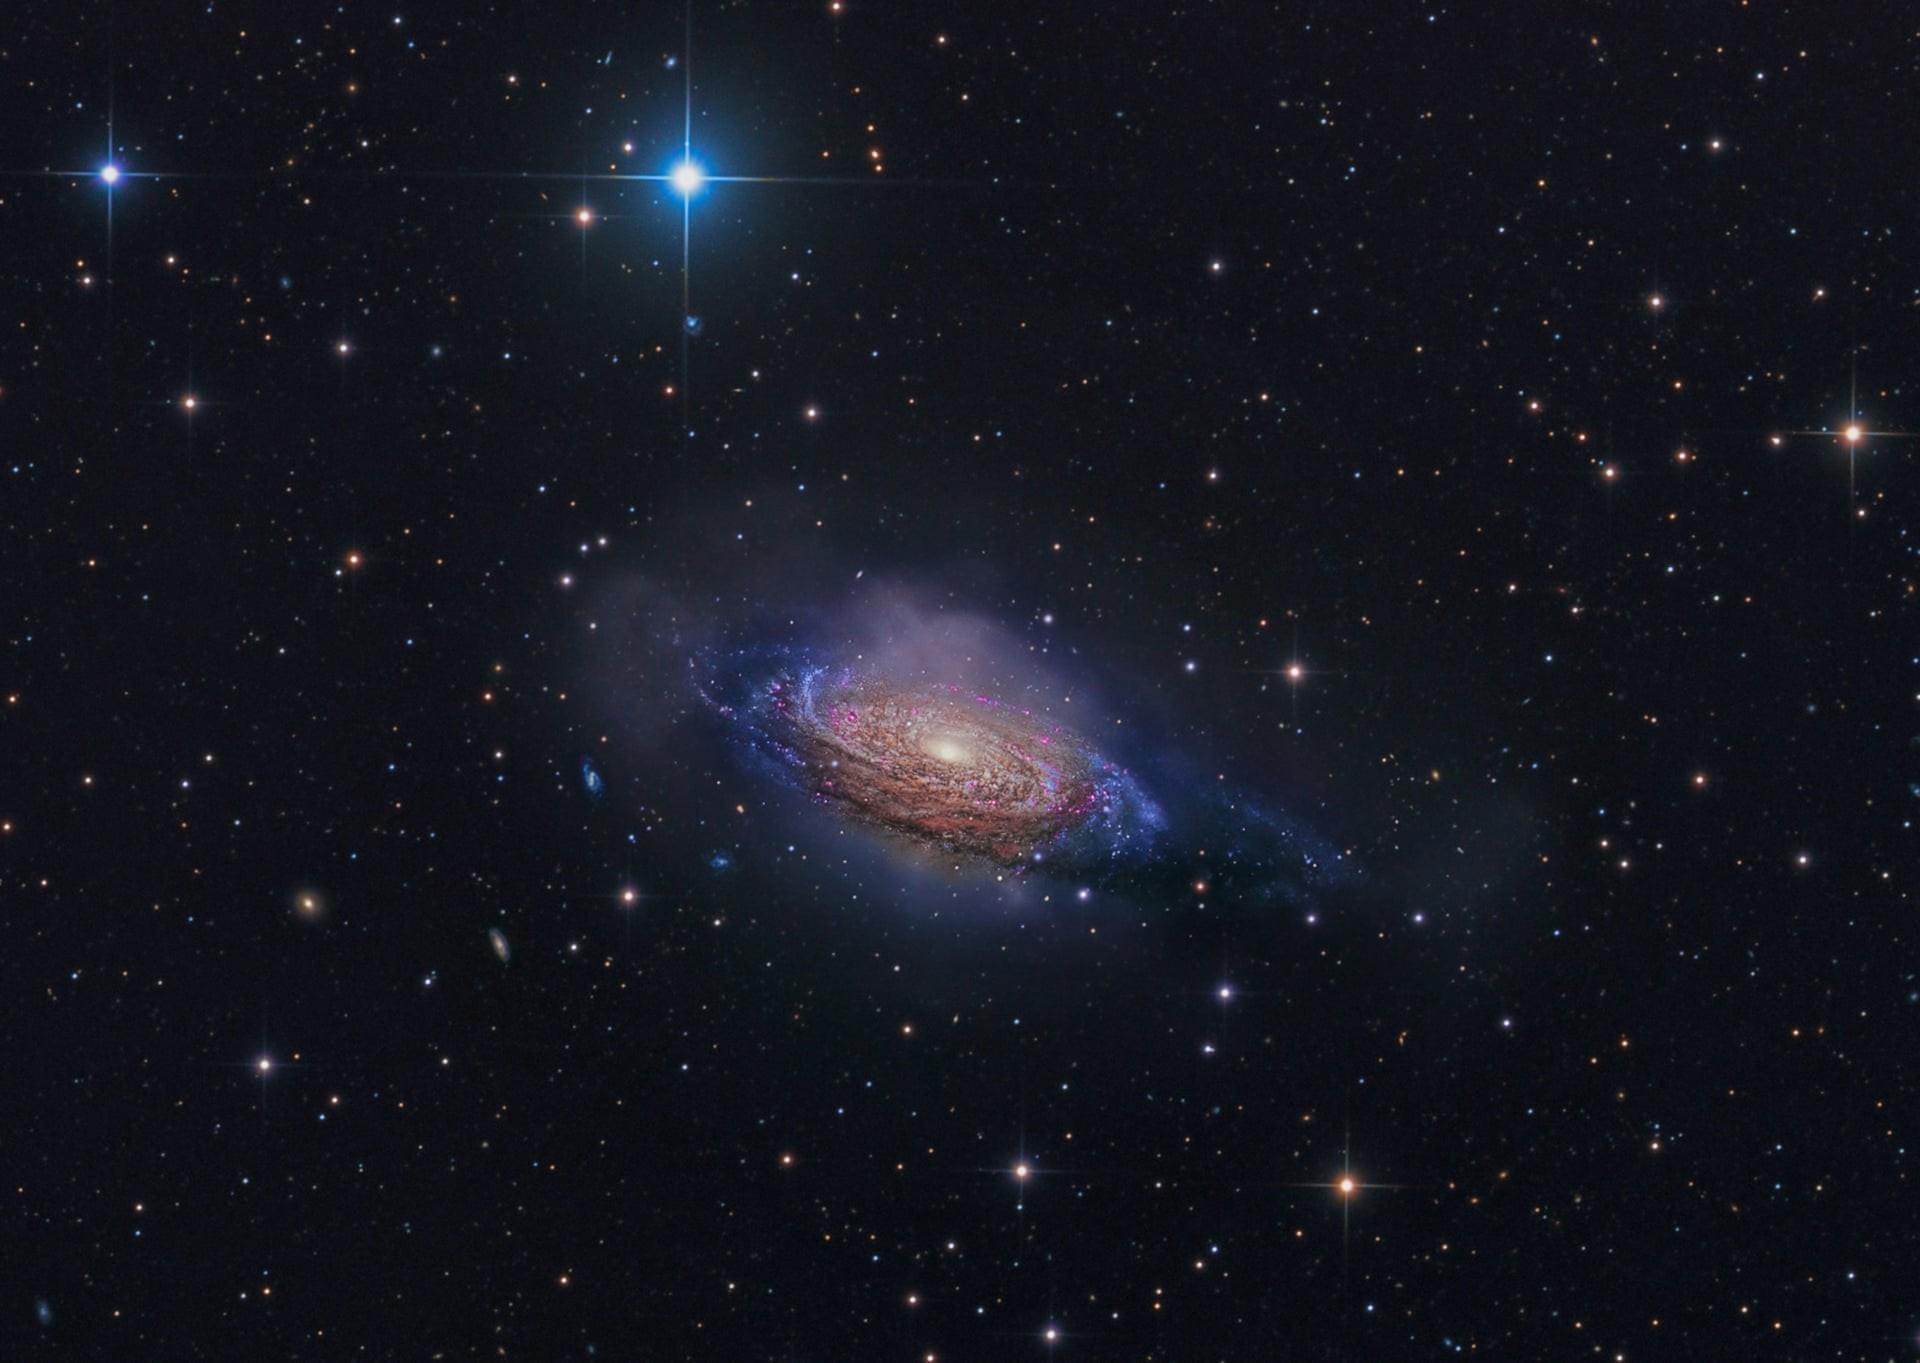 NGC 3521, Mysterious Galaxy do fotógrafo australiano Steven Mohr (Foto: Reprodução)